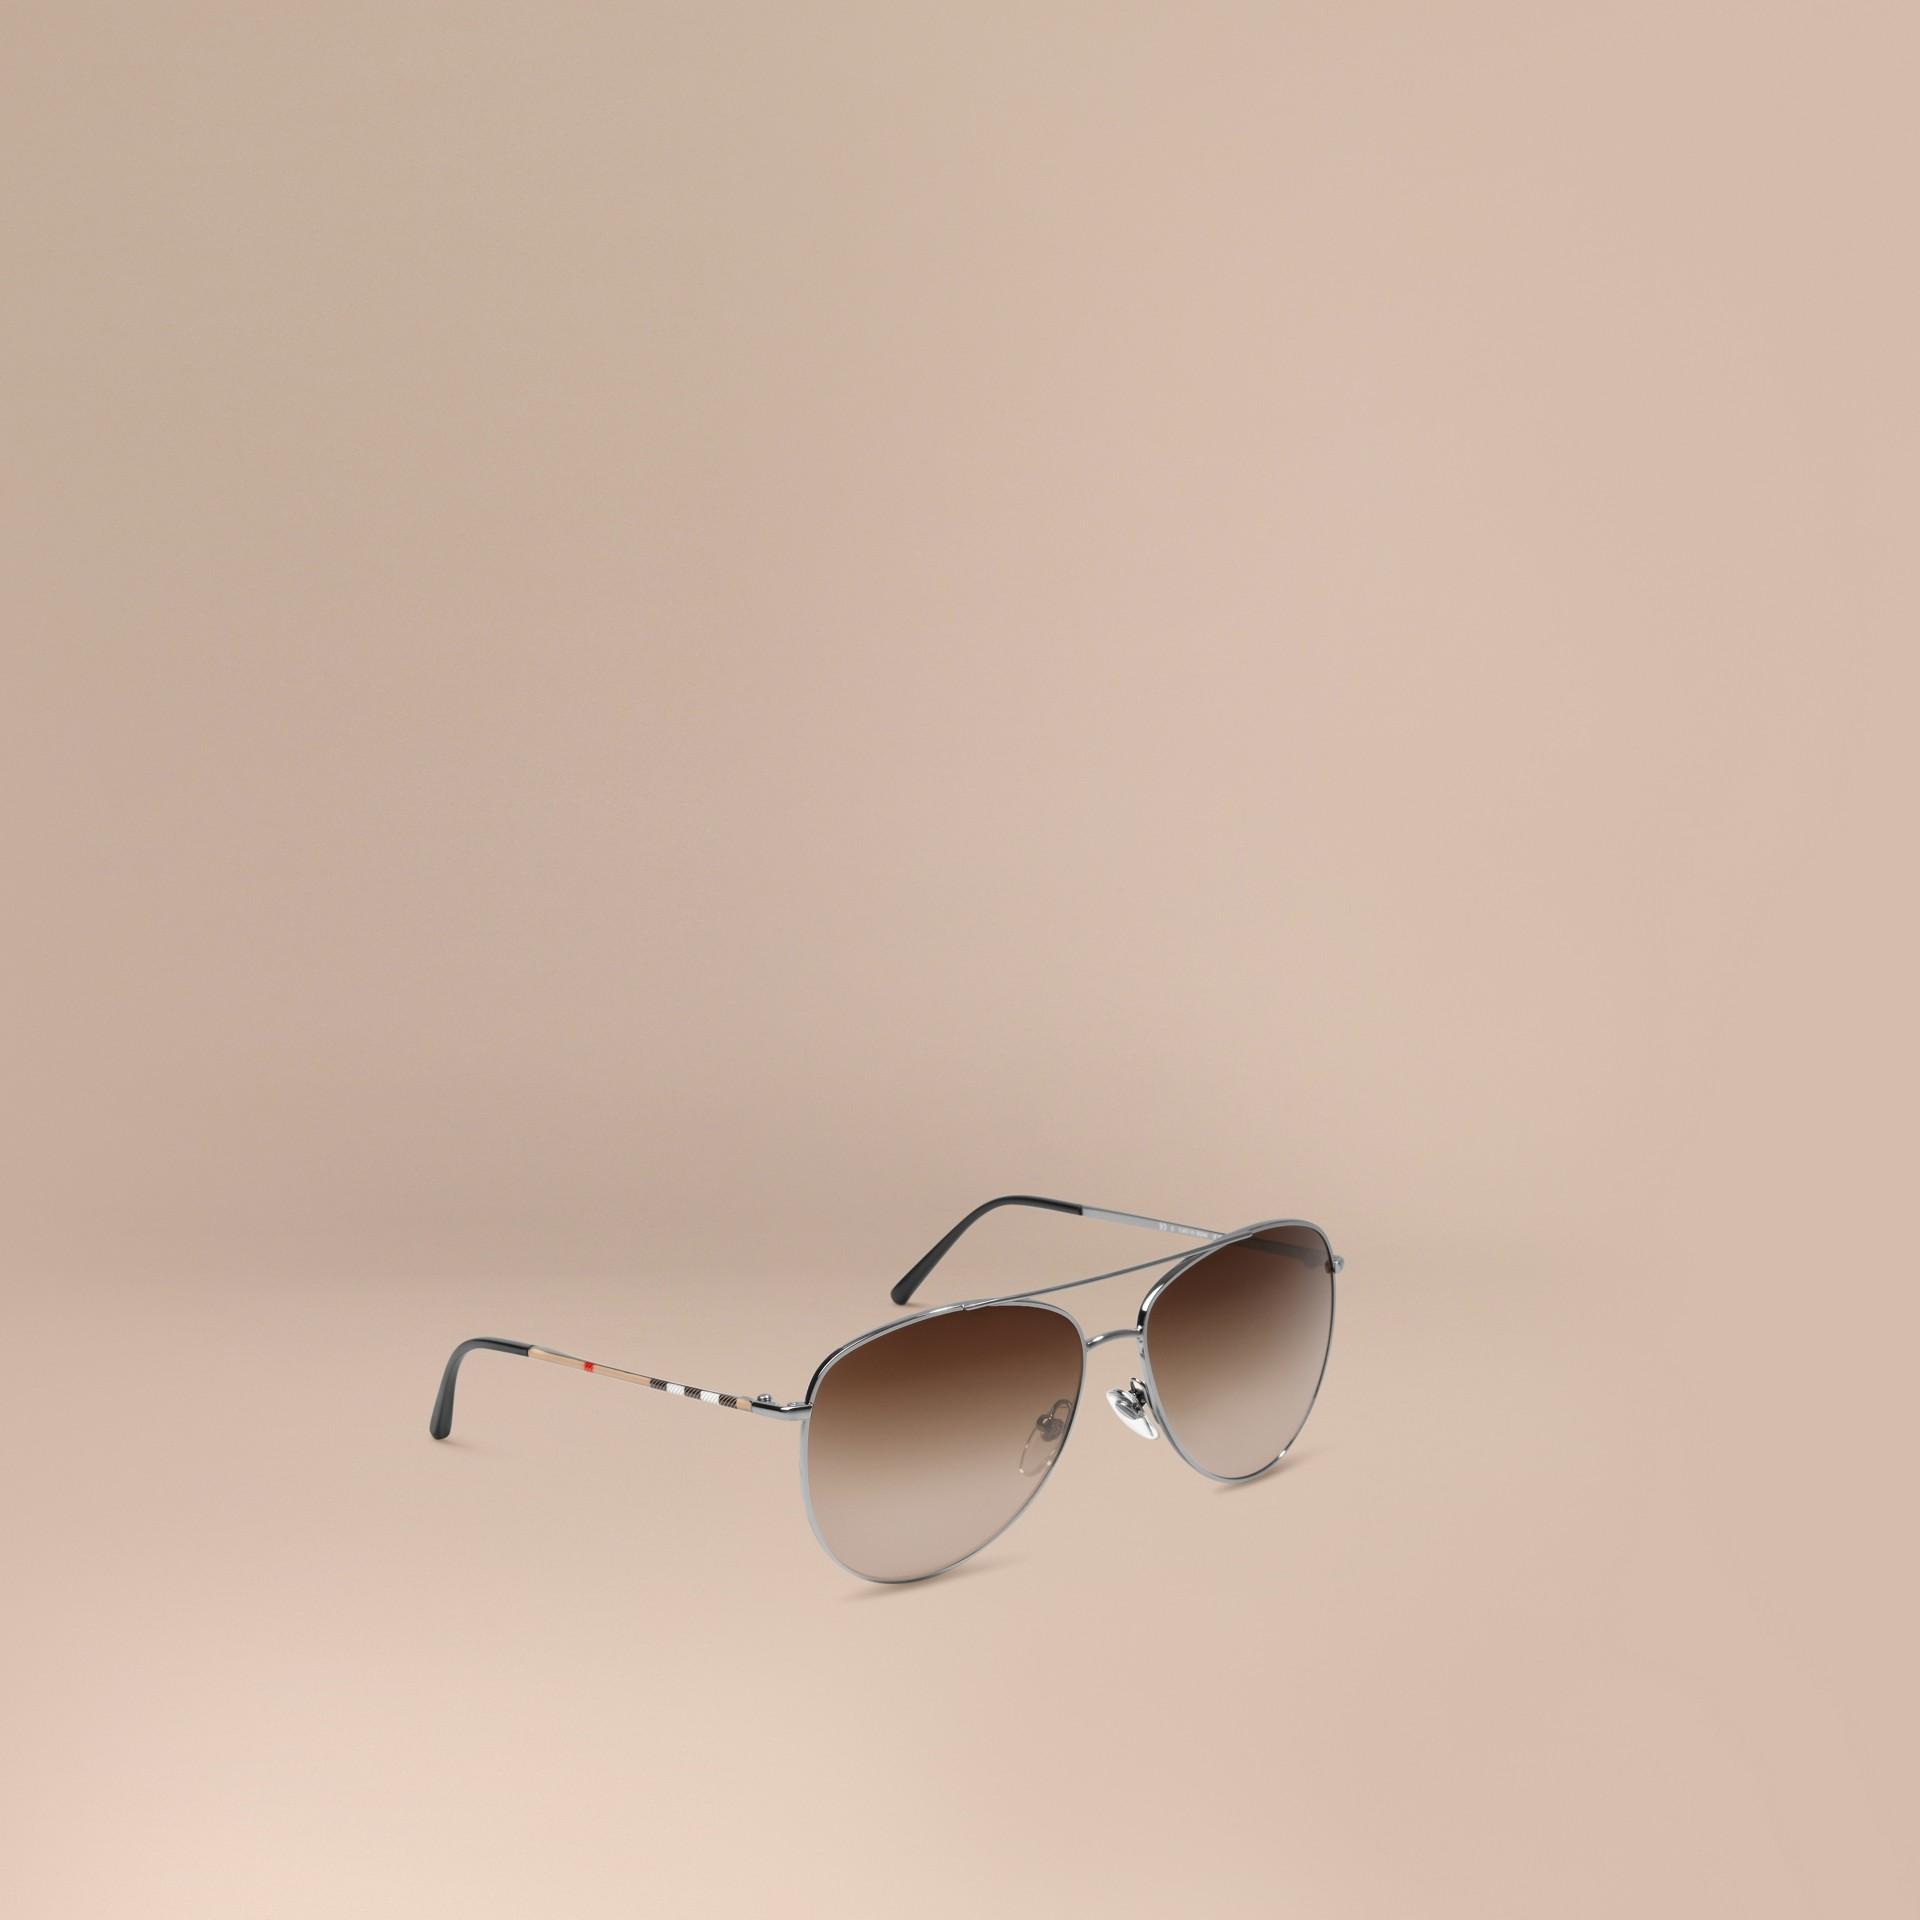 Nickel Check Arm Aviator Sunglasses Nickel - gallery image 1